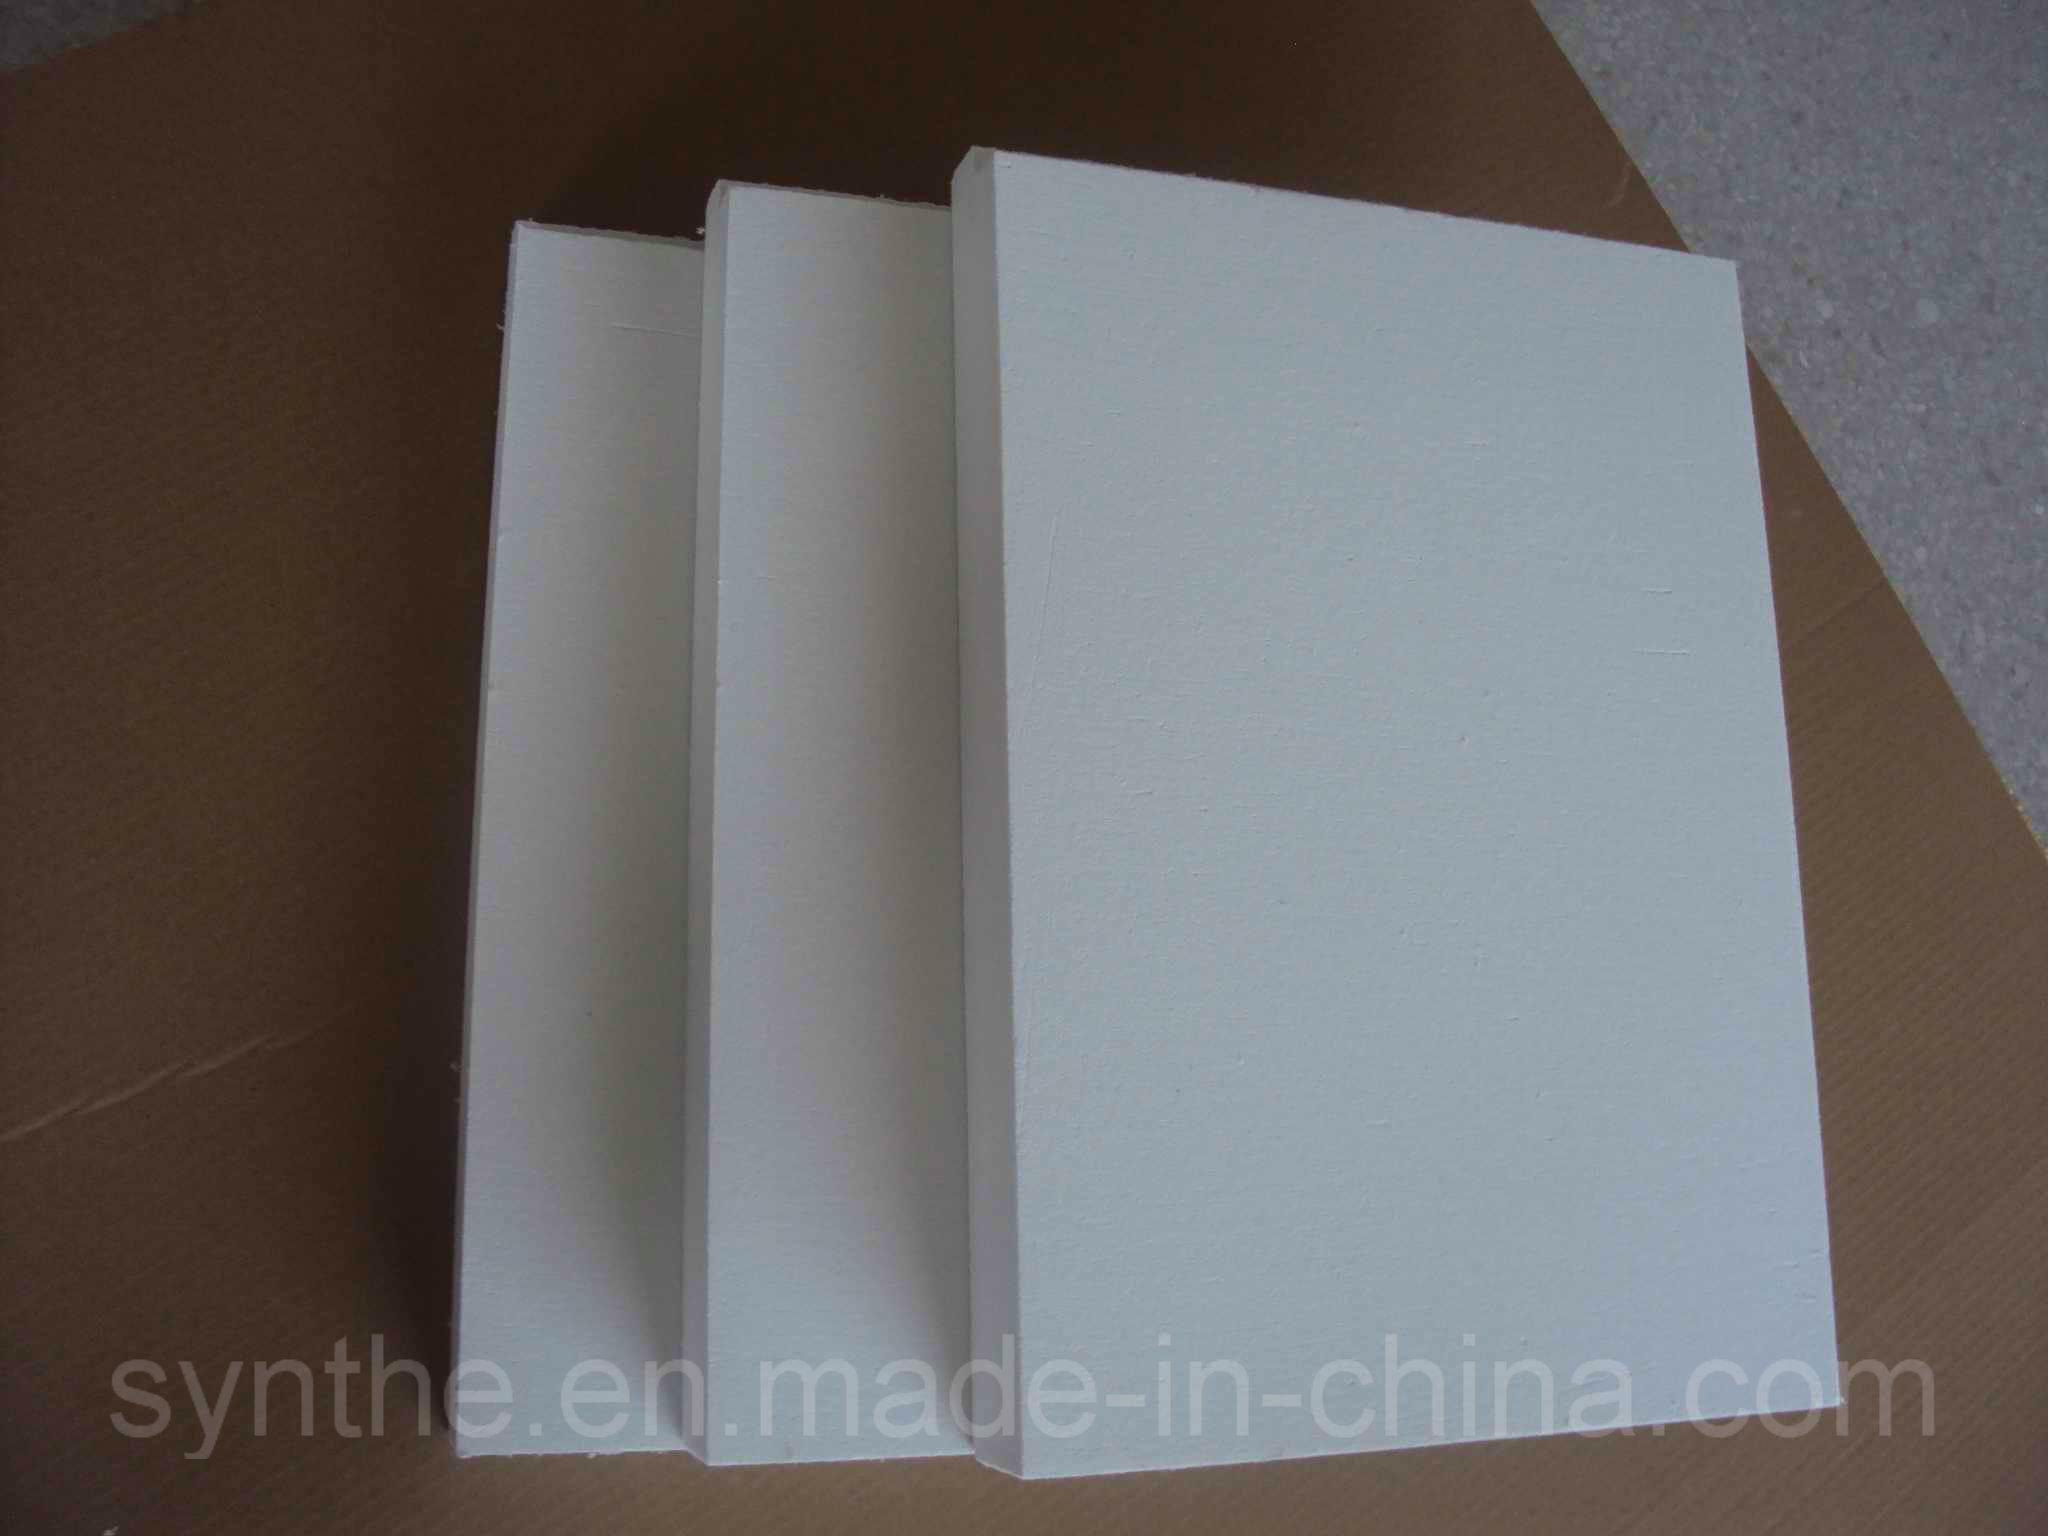 1260 High Purity Refractory Materical Ceramic Fiber Board